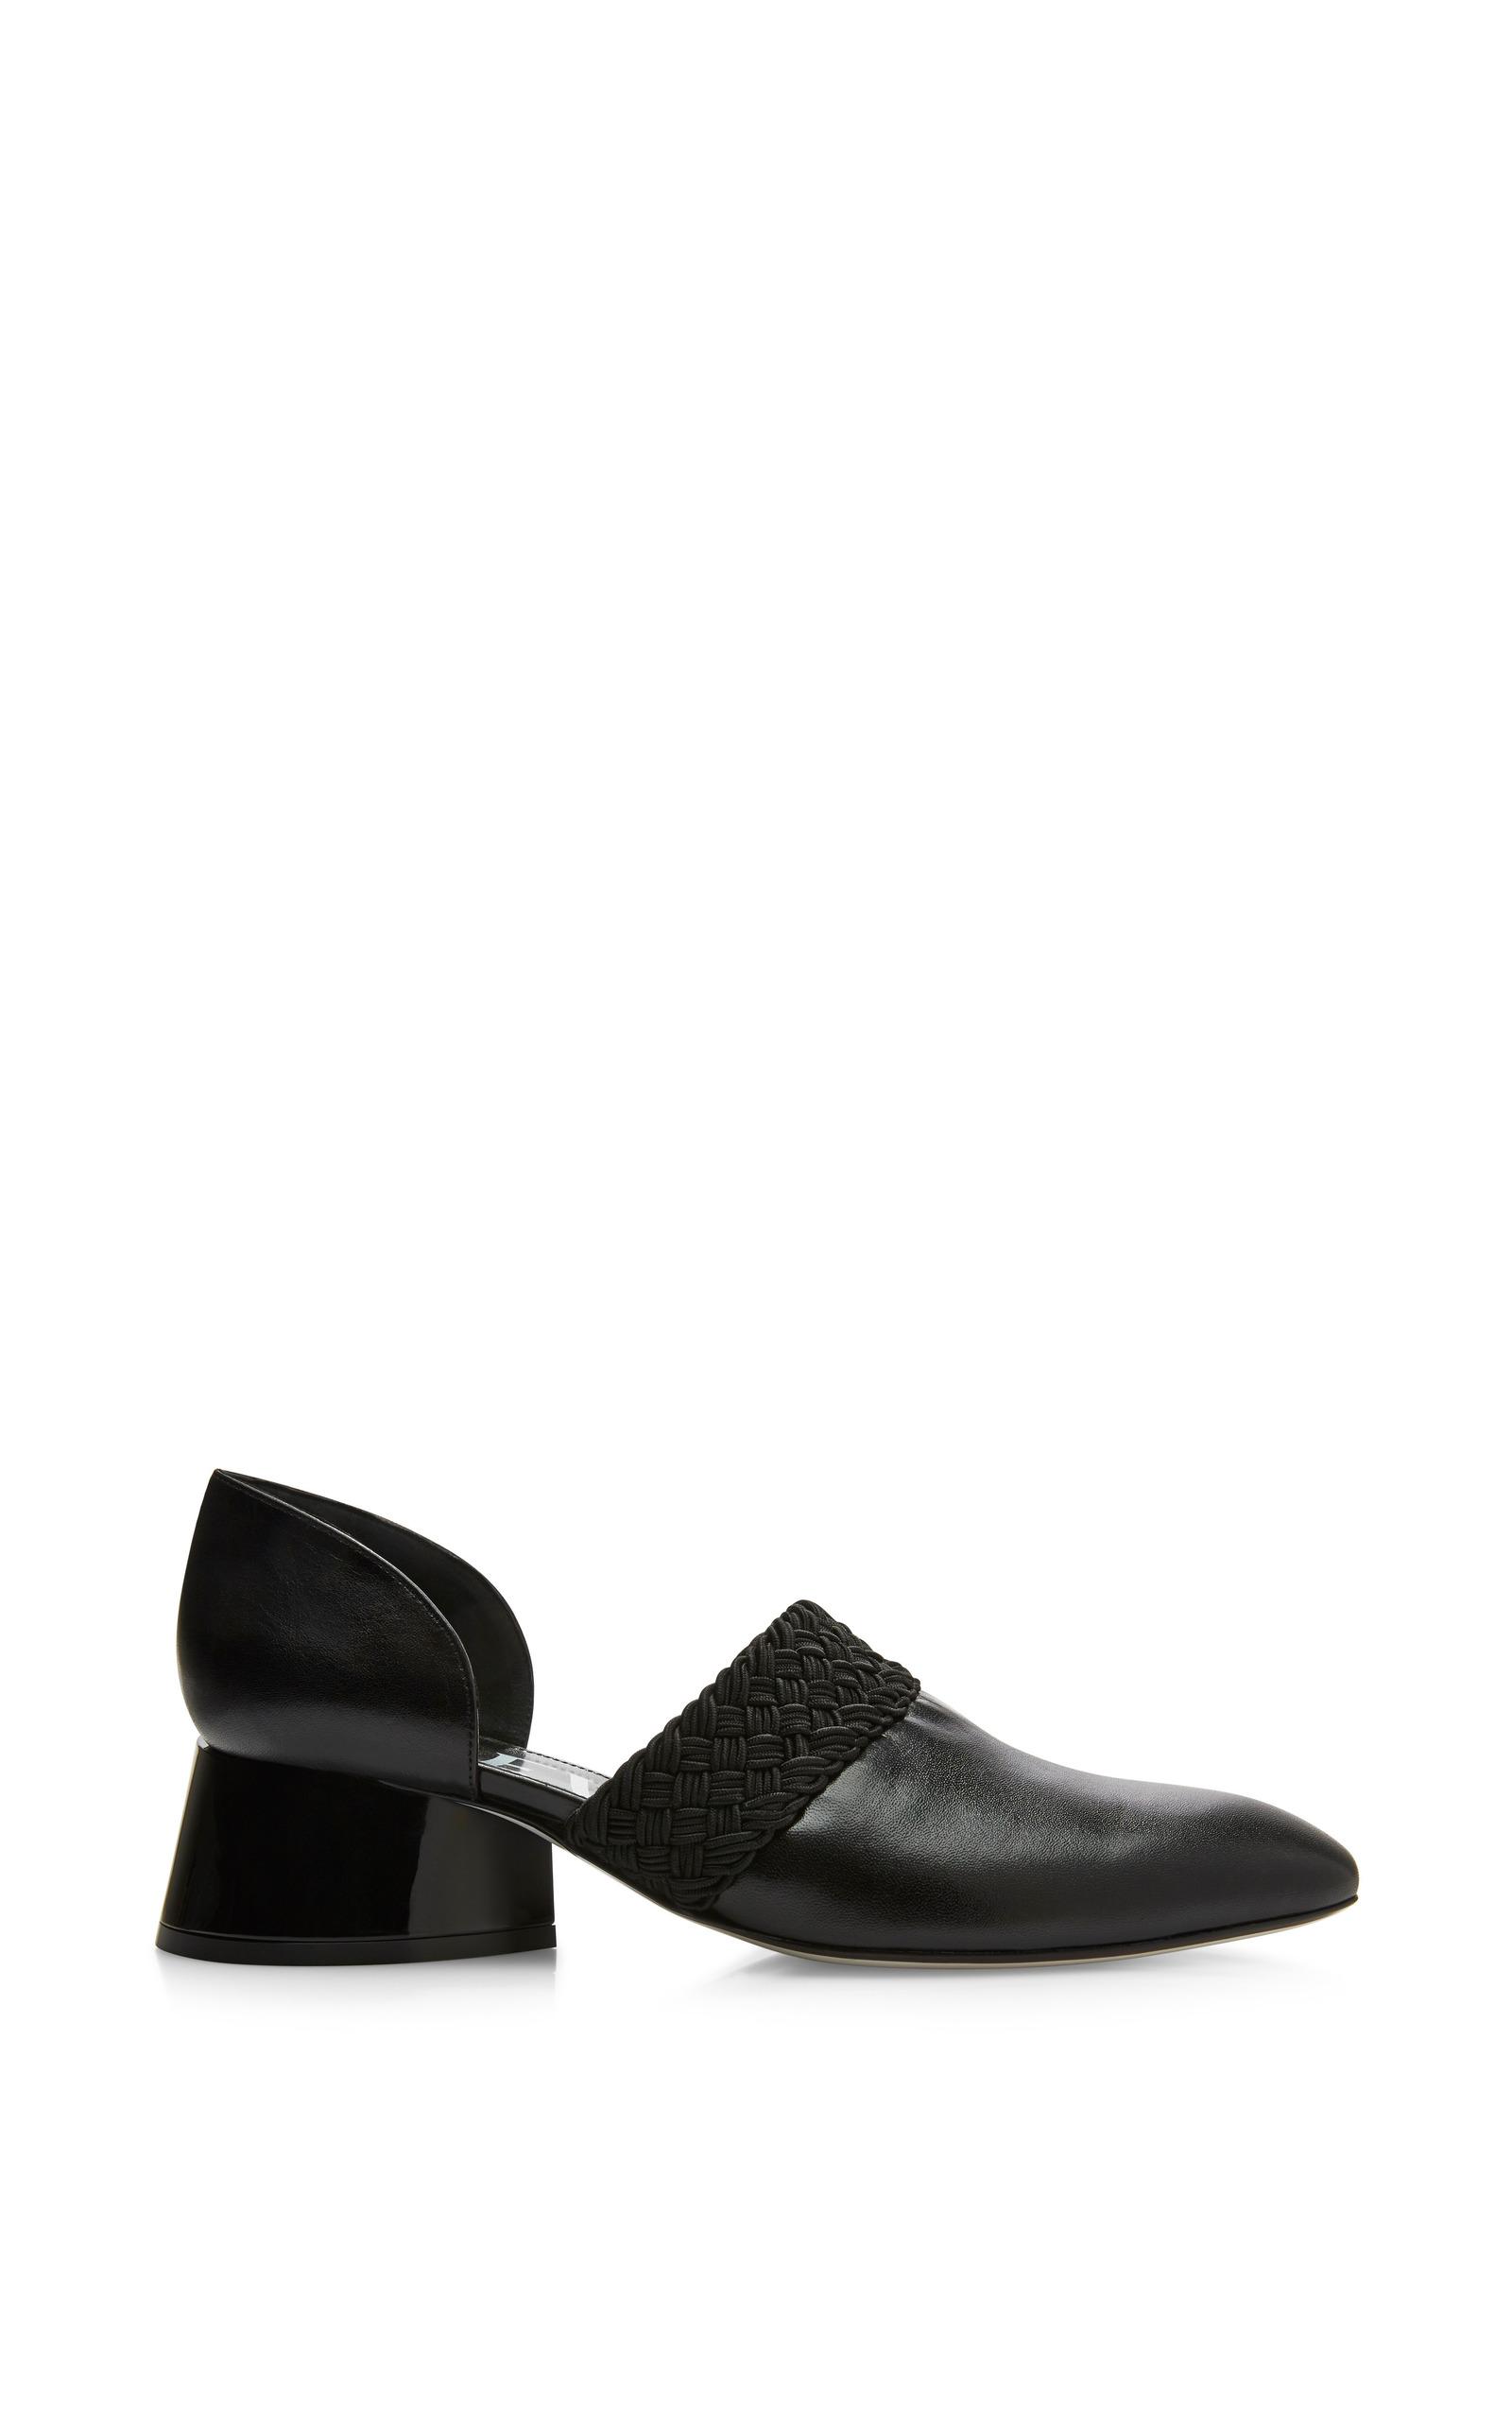 62362b61d73 LoeweBlack Lambskin Sculptural Heel Loafer. CLOSE. Loading